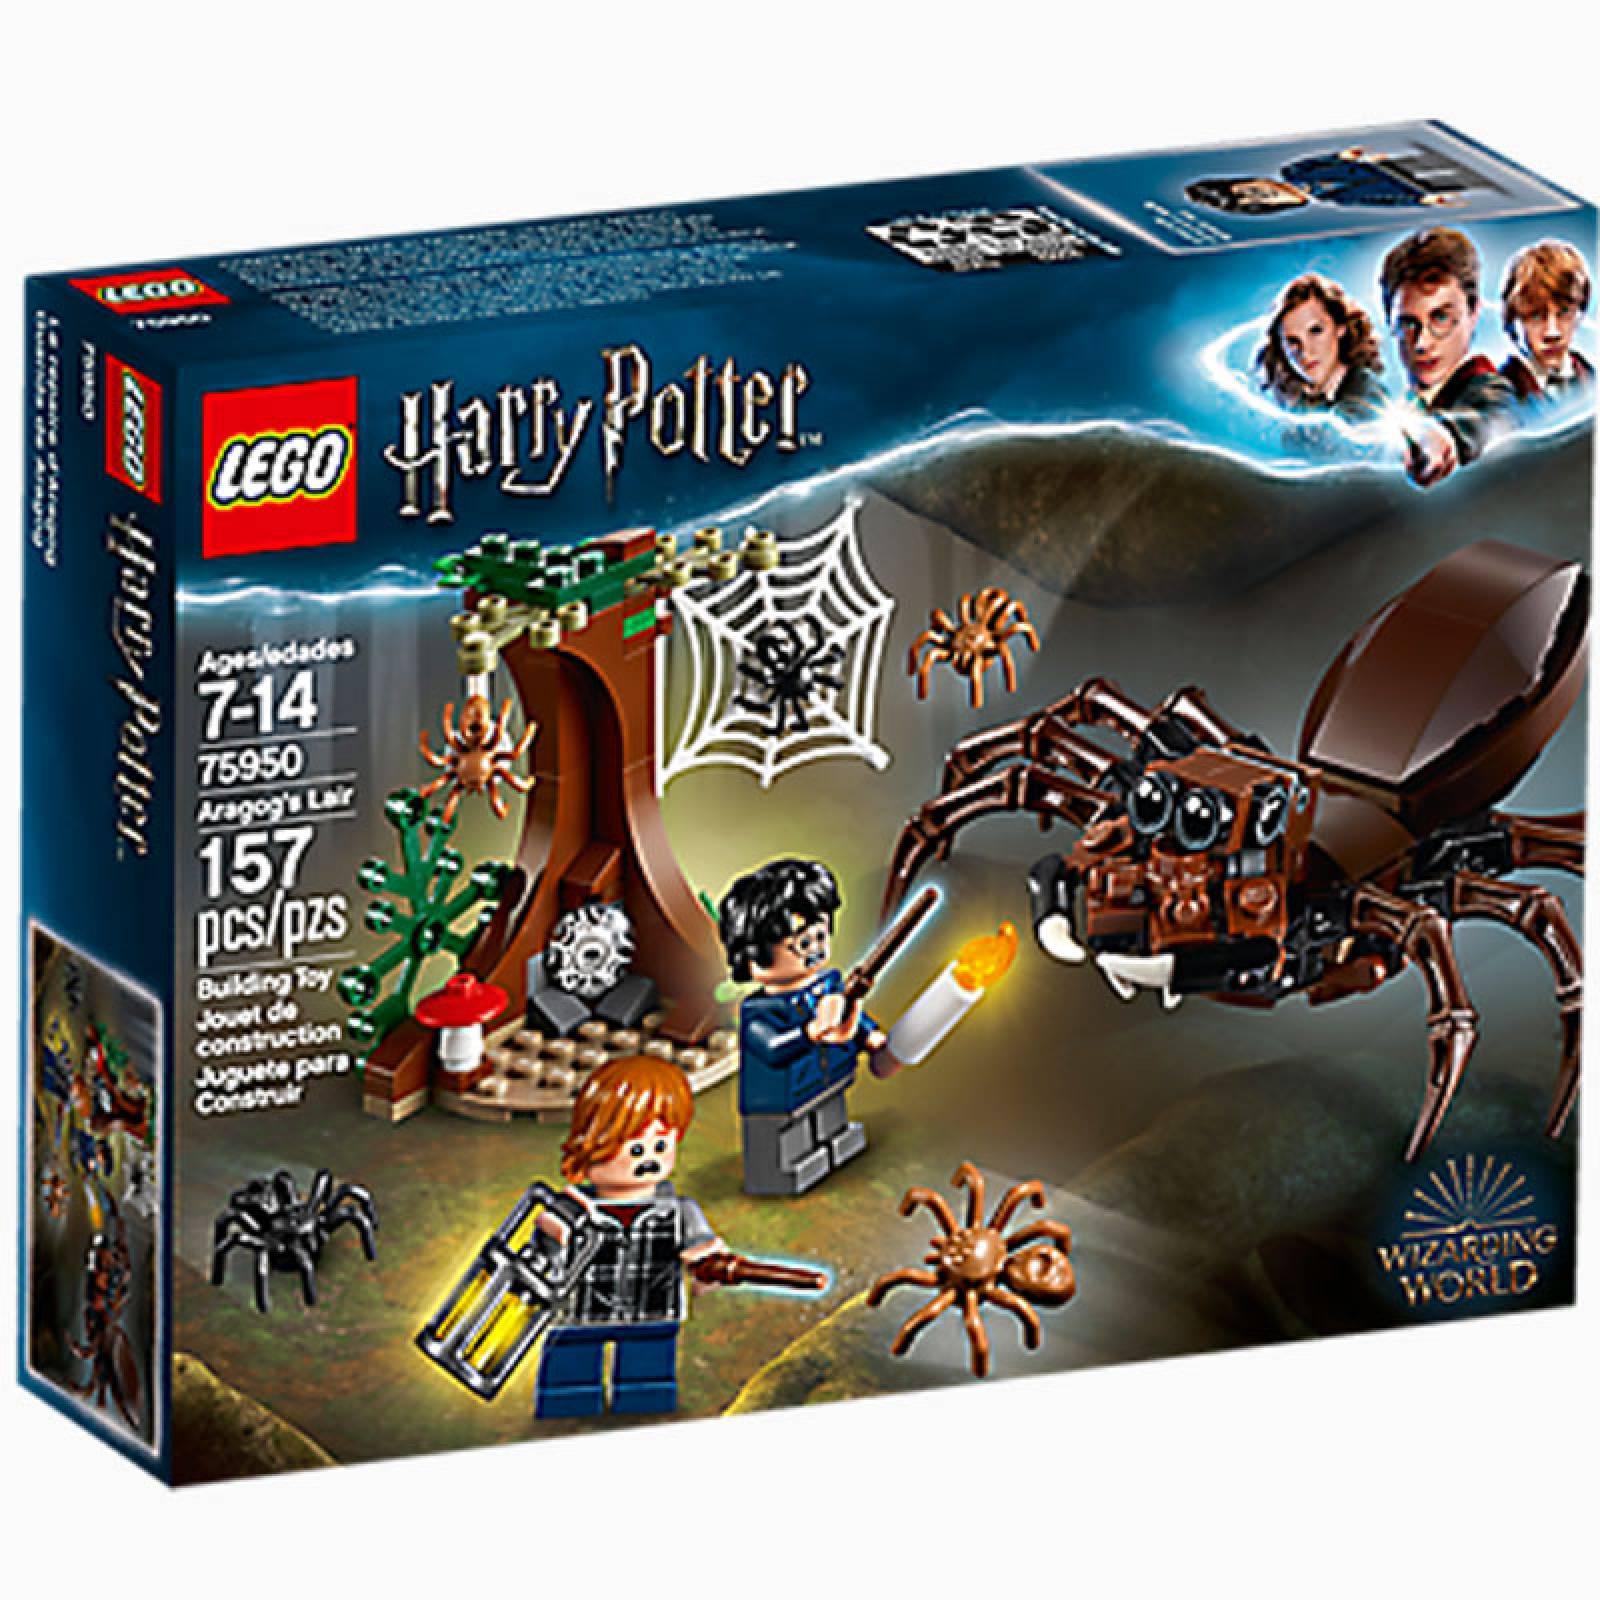 LEGO Harry Potter Aragog's Lair 75950 thumbnails